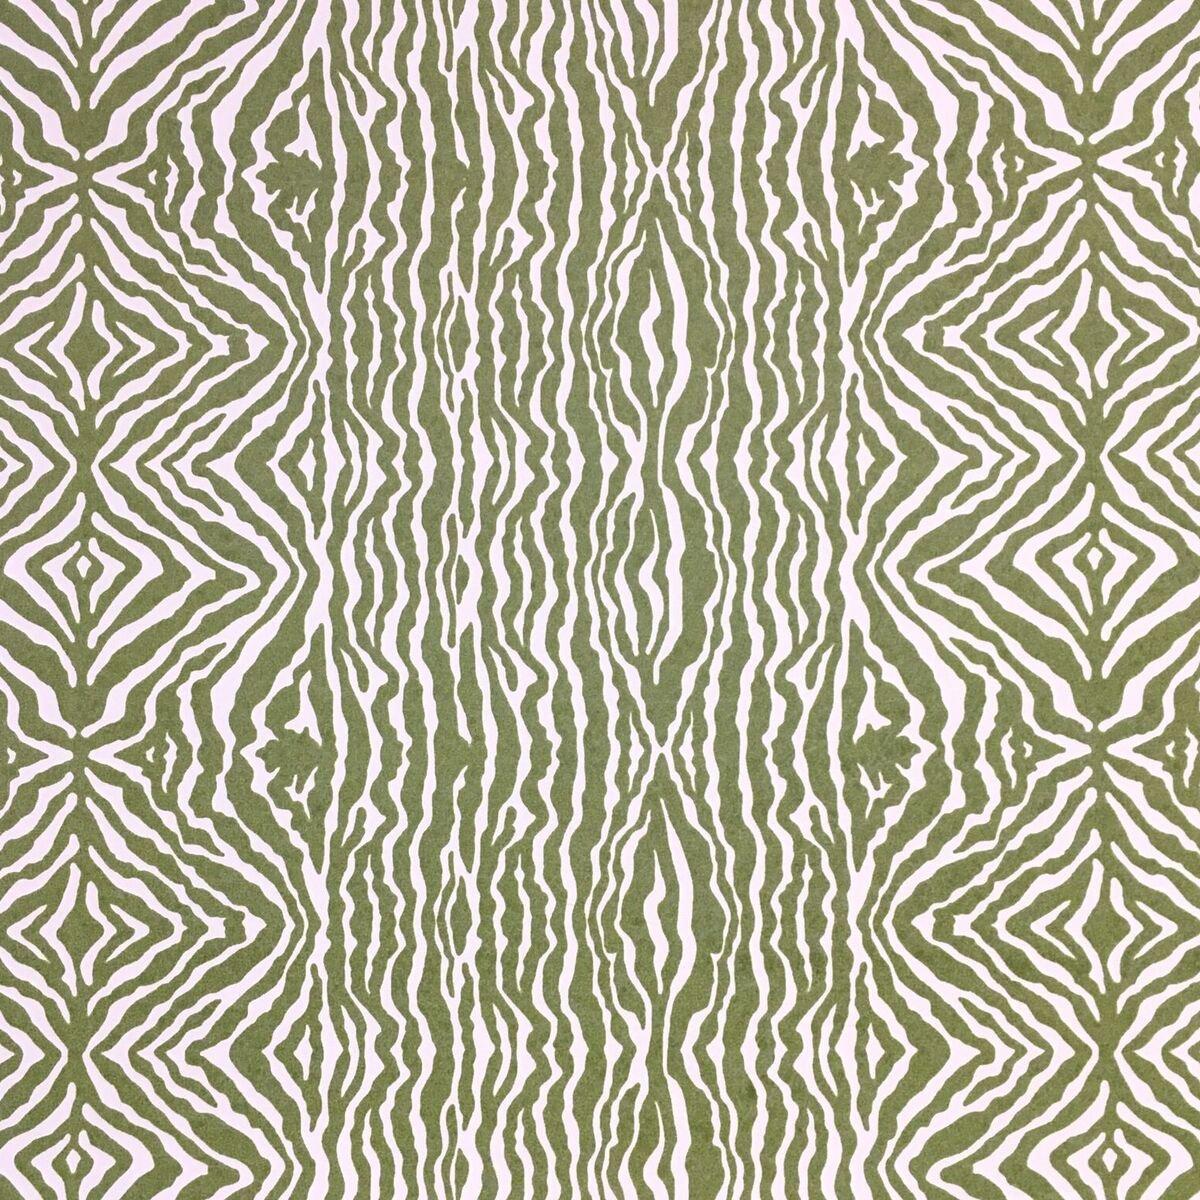 Grevys zebra stripe wallpaper kale